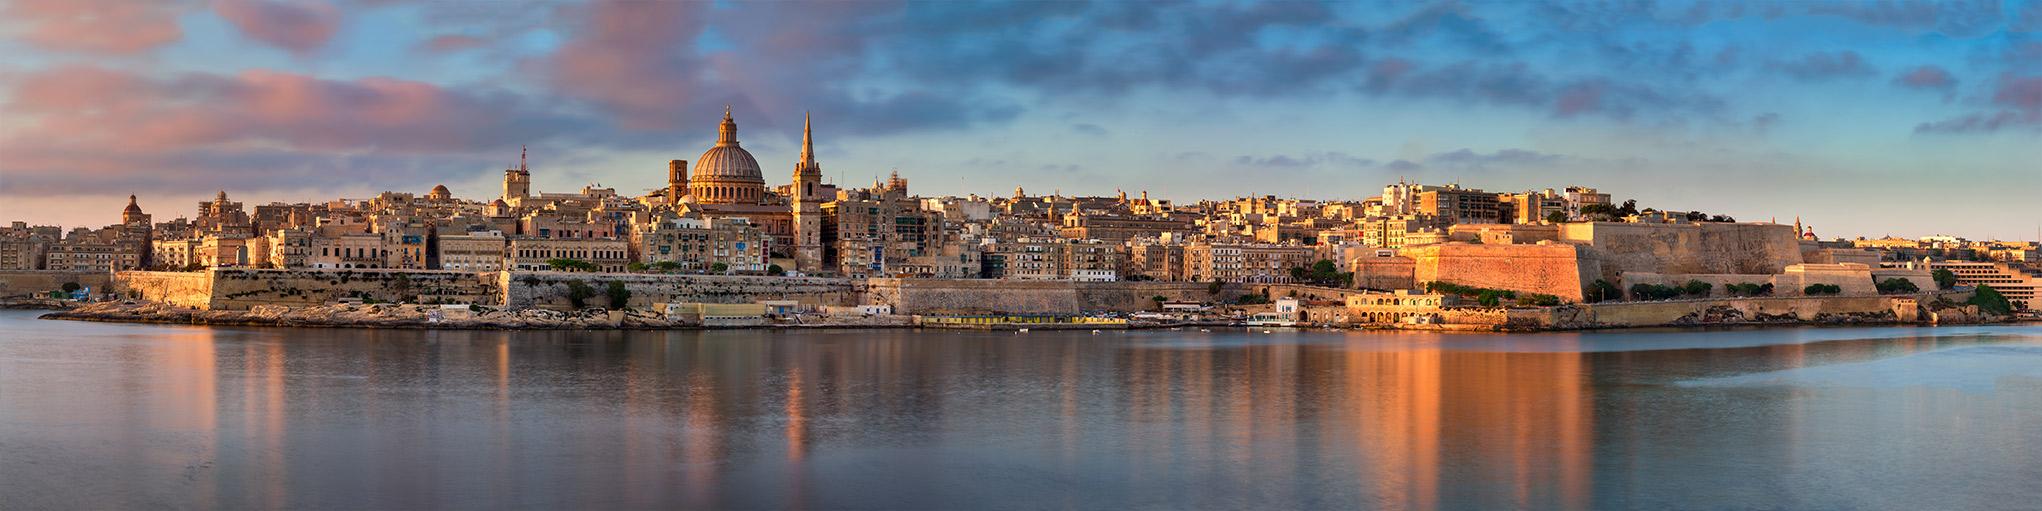 Sprachkurse auf Malta